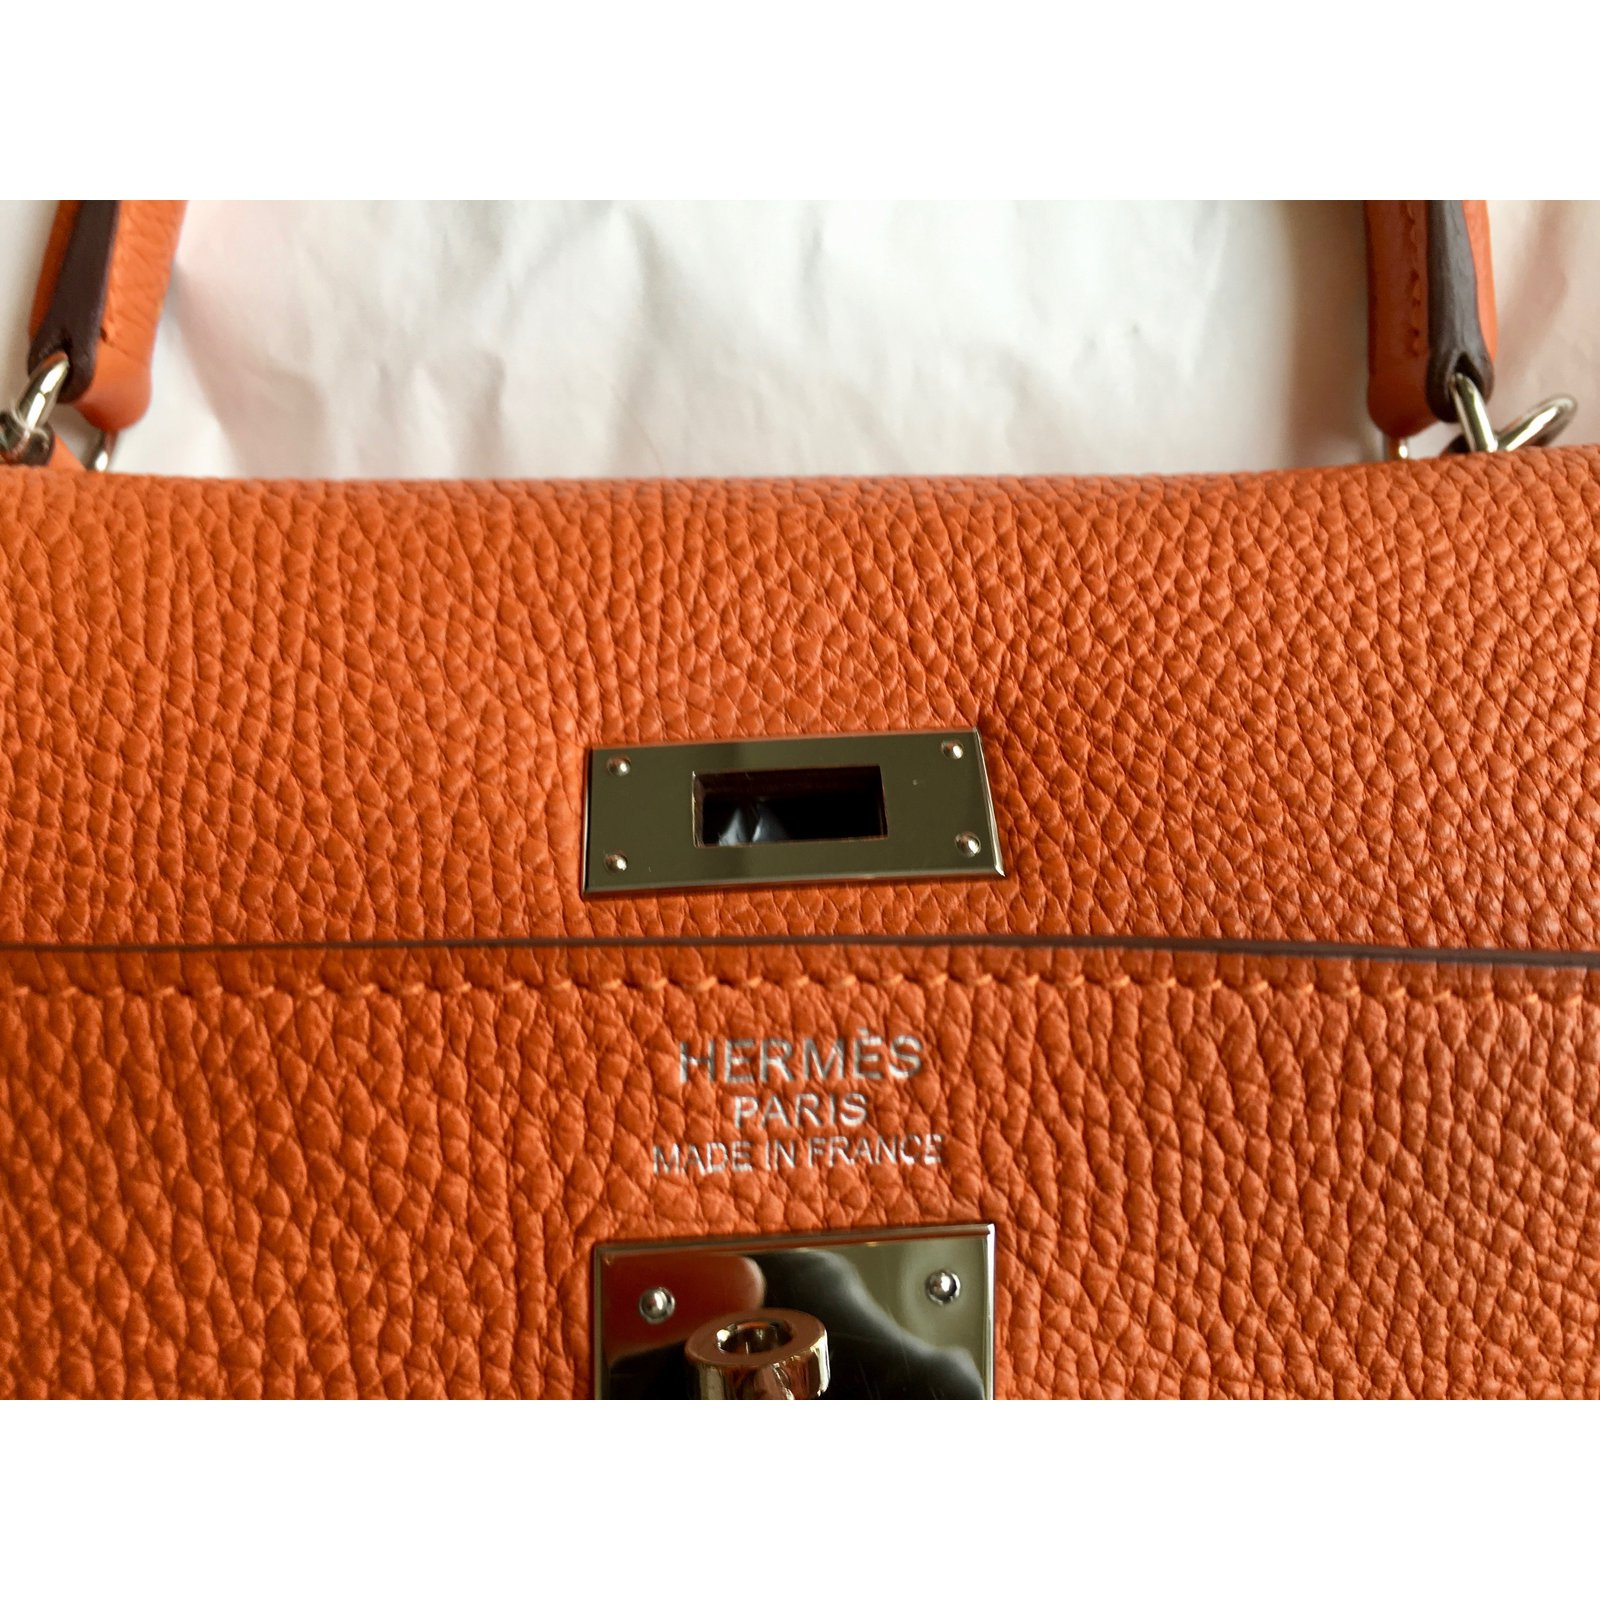 de30eb86e433 Hermès Kelly 35cm Togo orange Handbags Leather Orange ref.59773 - Joli  Closet